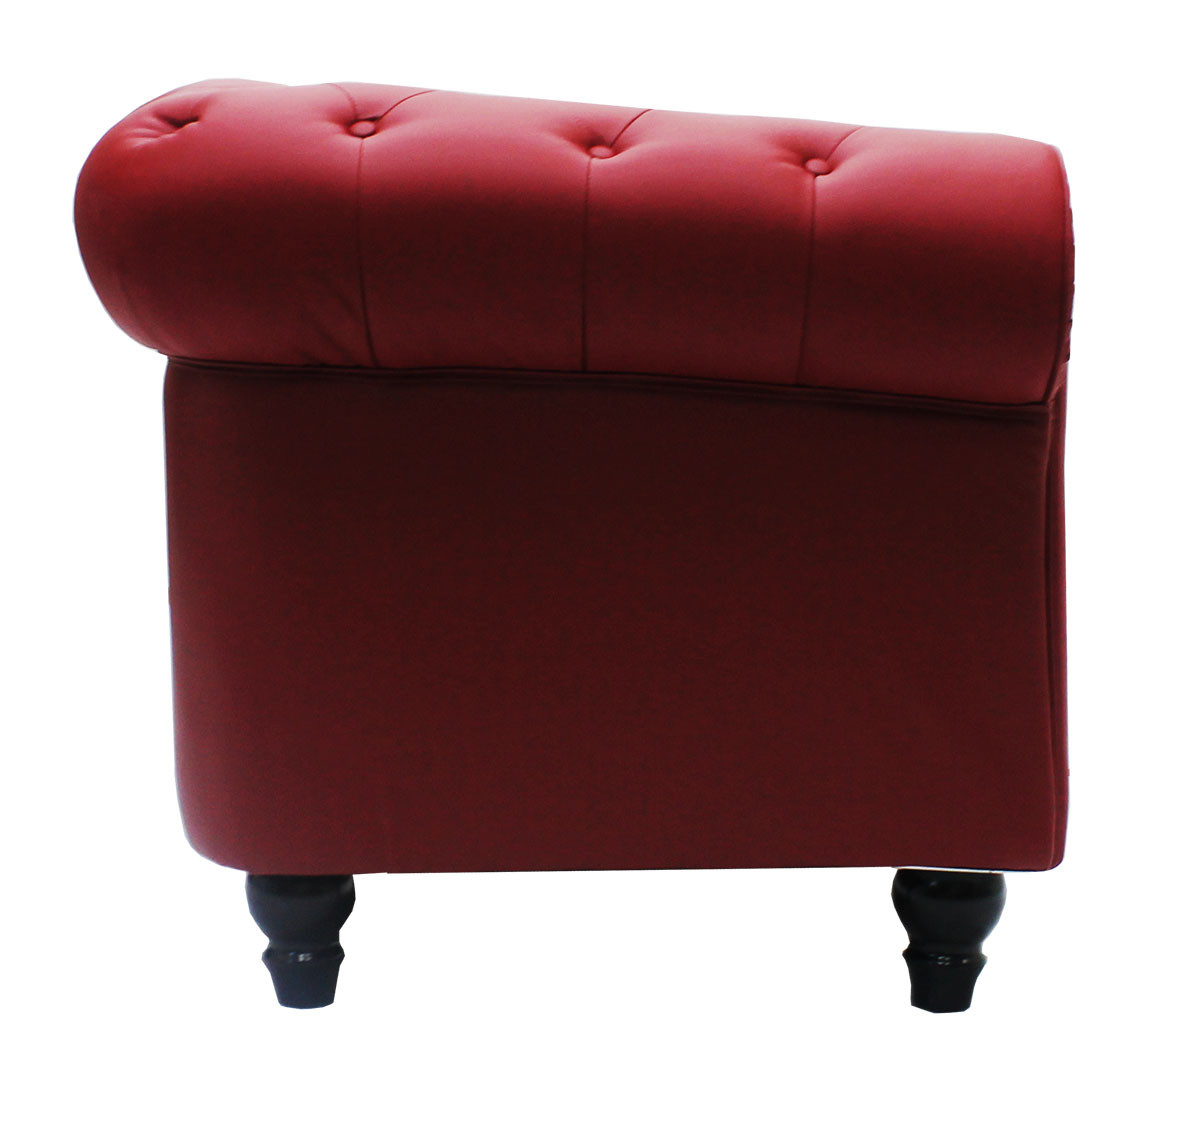 Awe Inspiring Benjamin Classical 3 Seater Pu Leather Sofa Maroon Pdpeps Interior Chair Design Pdpepsorg